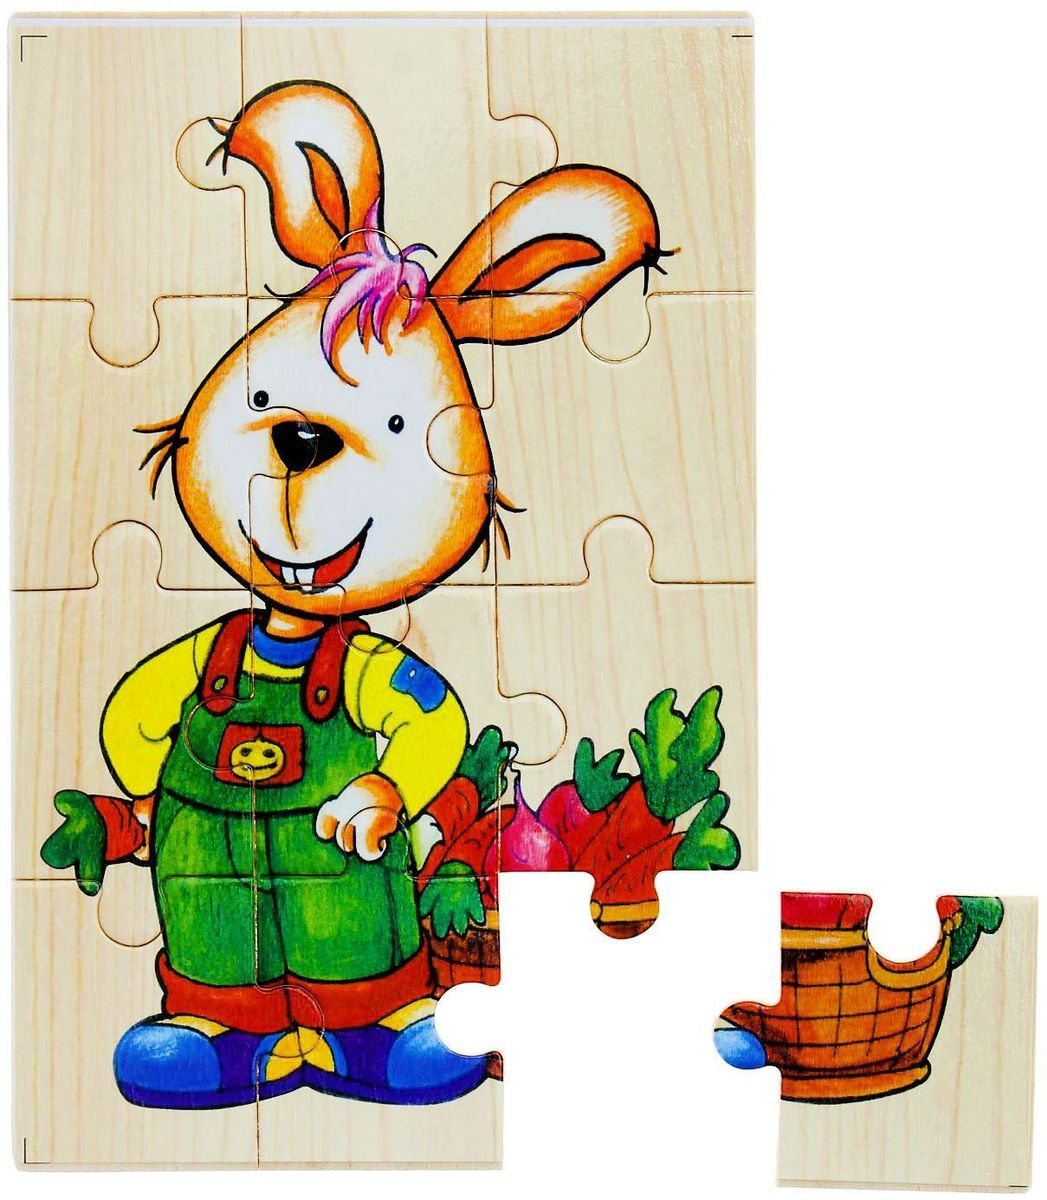 Лесная мастерская Пазл для малышей Зайчик [sa]us imports bussmann fuses bs88 4 fuses 355mt 355a 690v